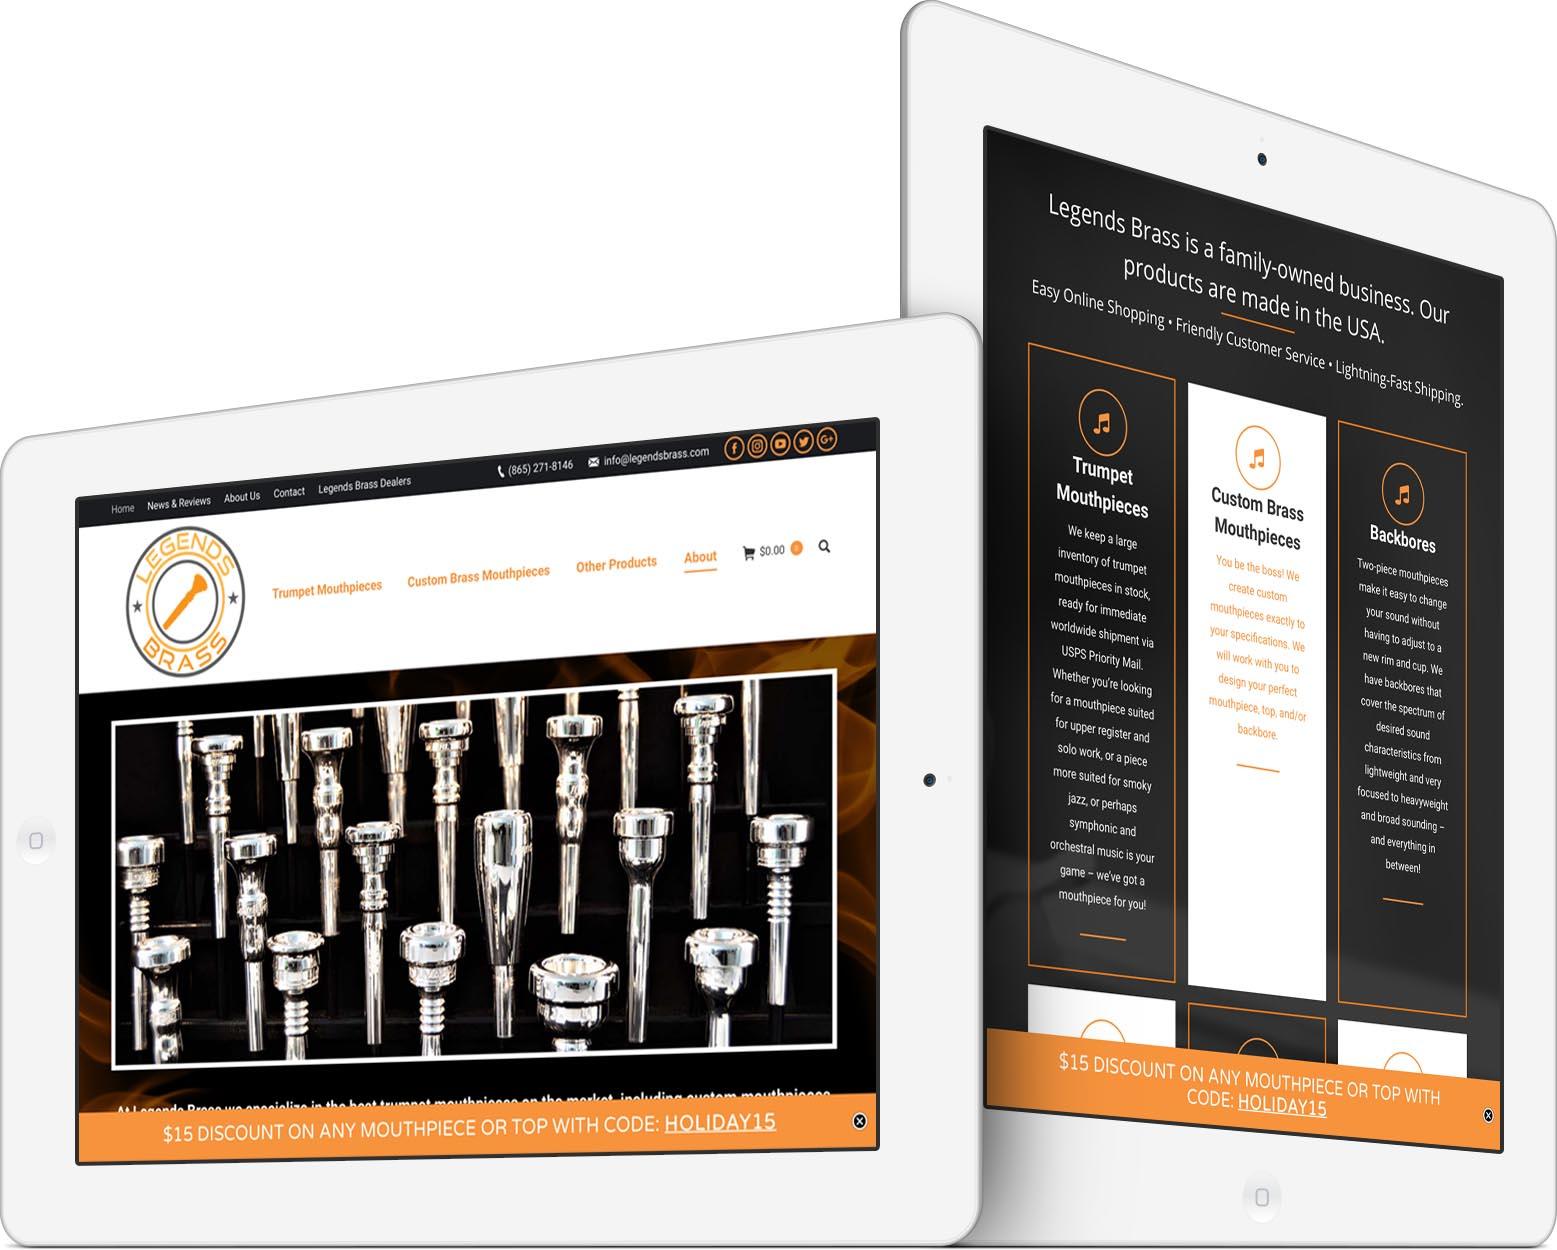 Legends Brass Responsive Web Design